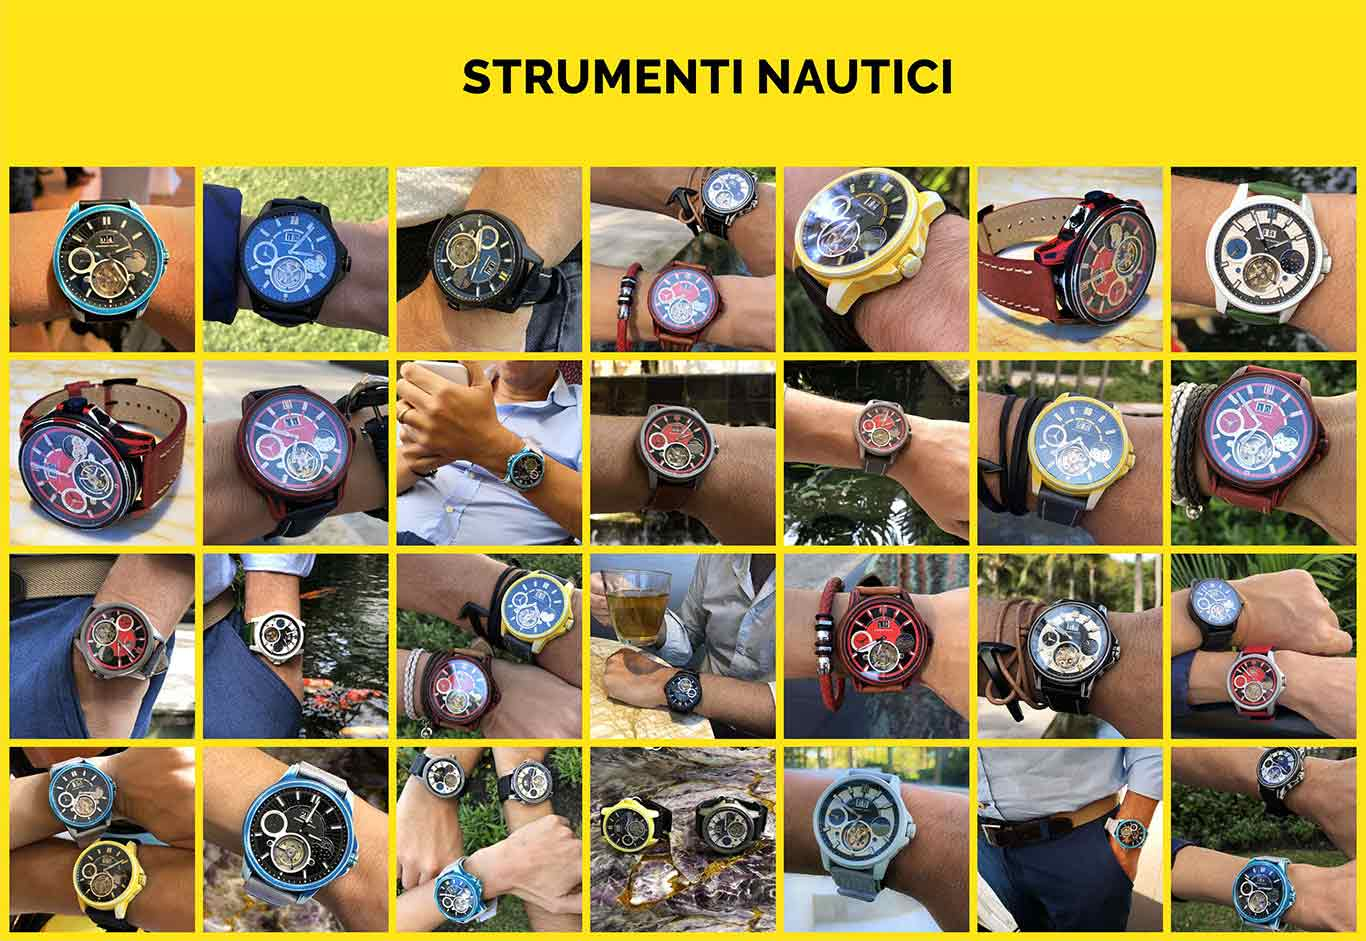 11 Strumenti Nautici Automatic Tourbillon Titanium Cerakote Watch